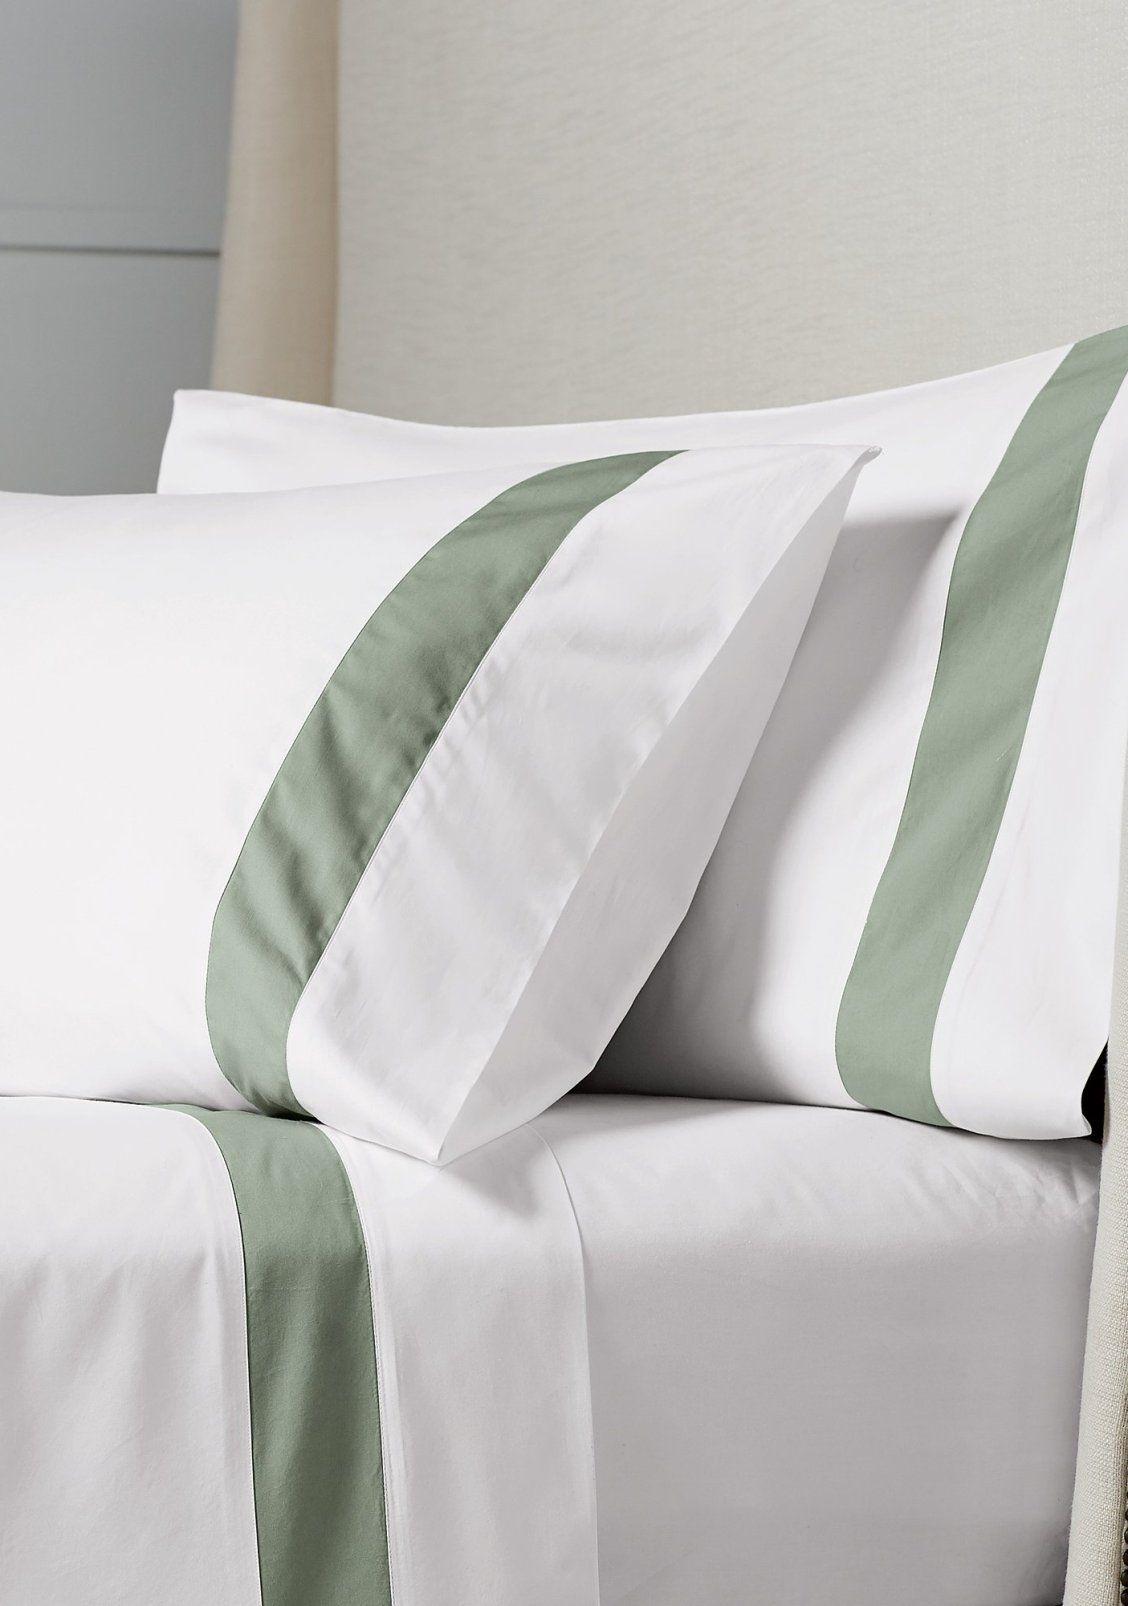 Resort Border Frame Egyptian Cotton Percale Sheet Set Frontgate Bed Cover Design Star Bedding Sleep Accessories 100 egyptian cotton percale sheets